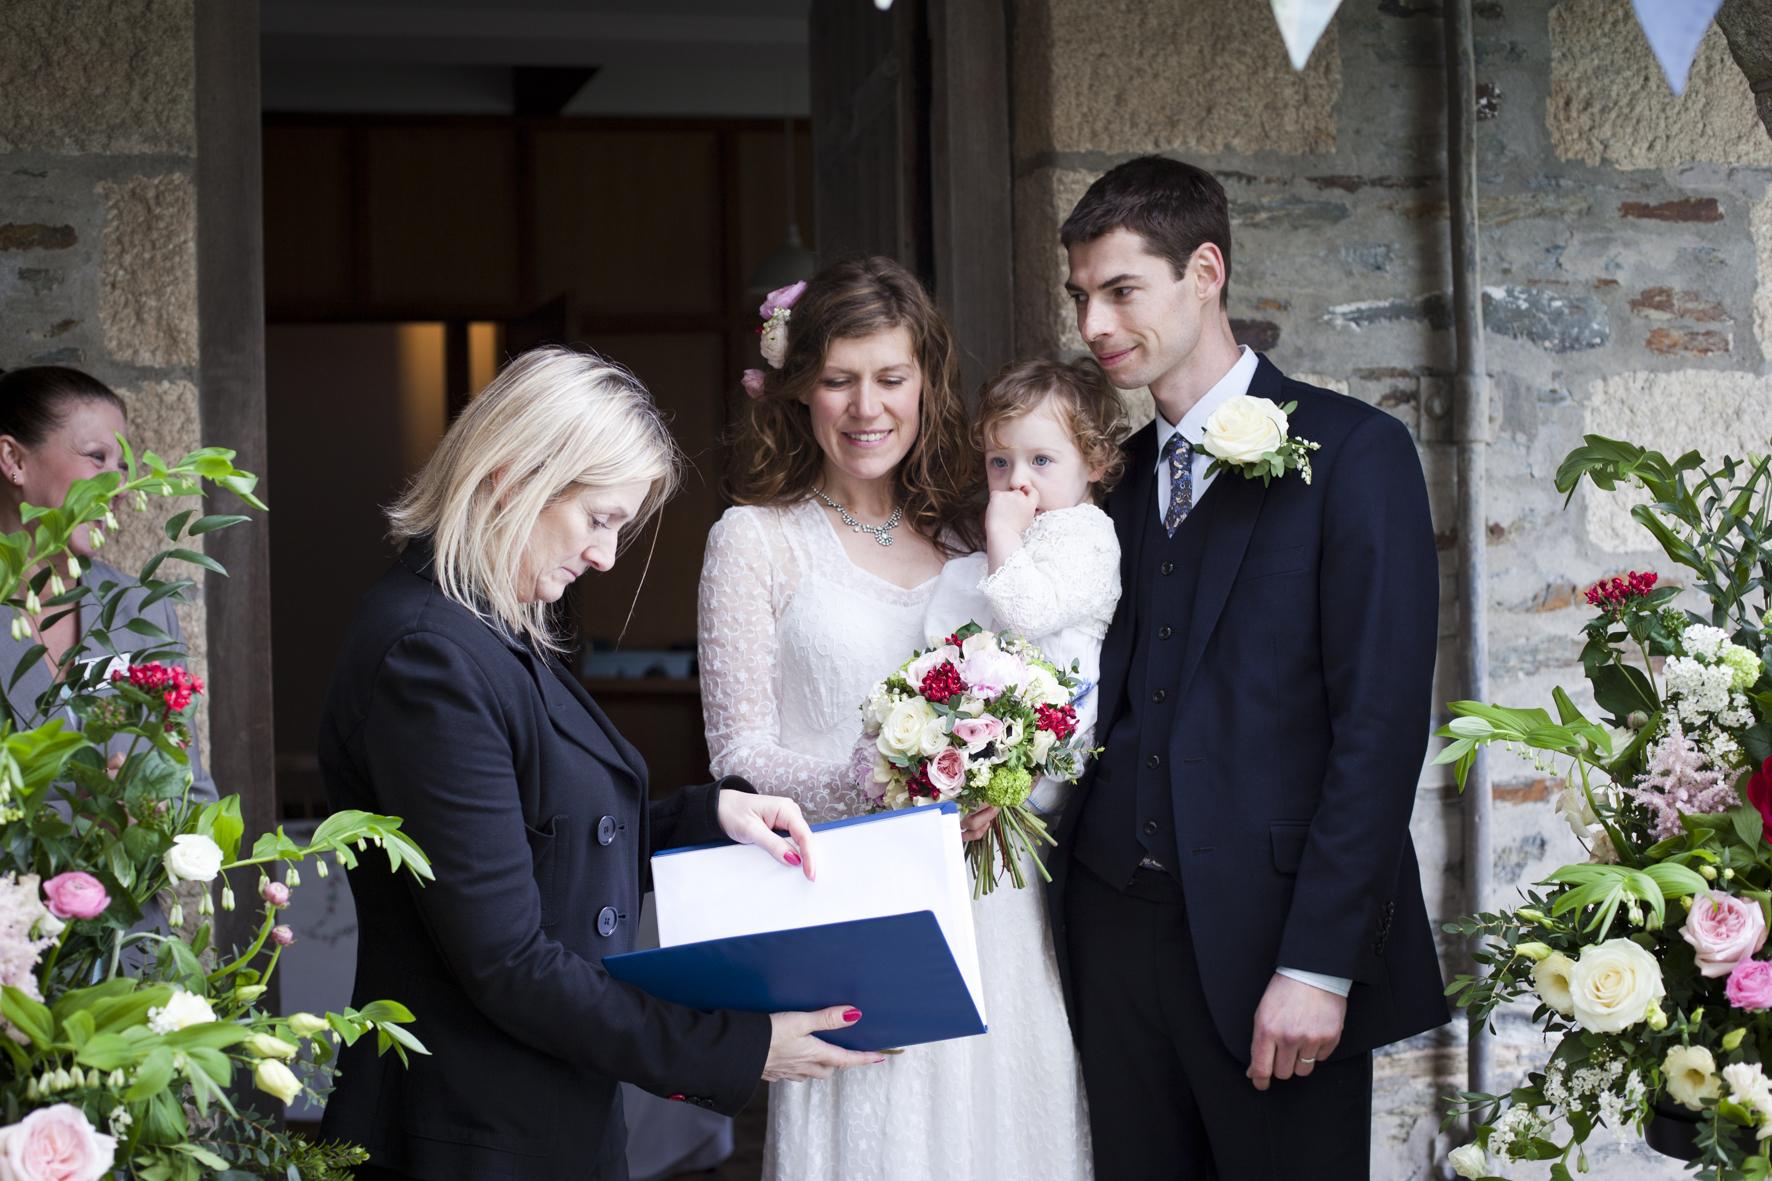 Wedding example_M&P__MG_3531_Claudia Leisinger.jpg